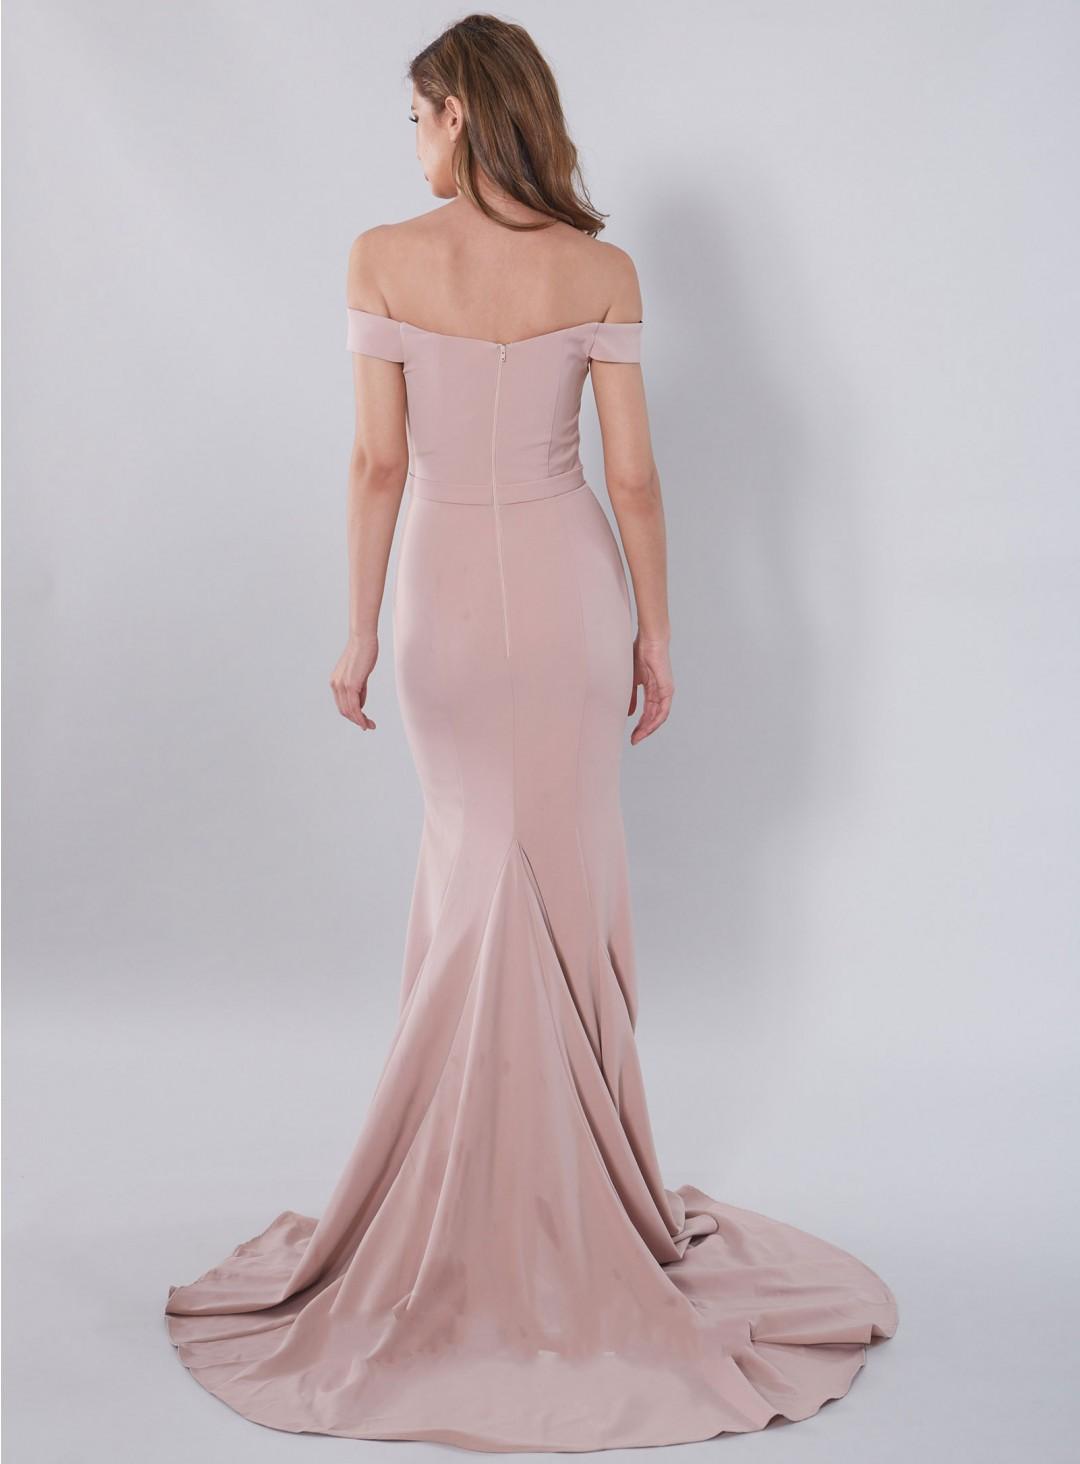 eecb041333 ... Sexy Mermaid Prom Dress